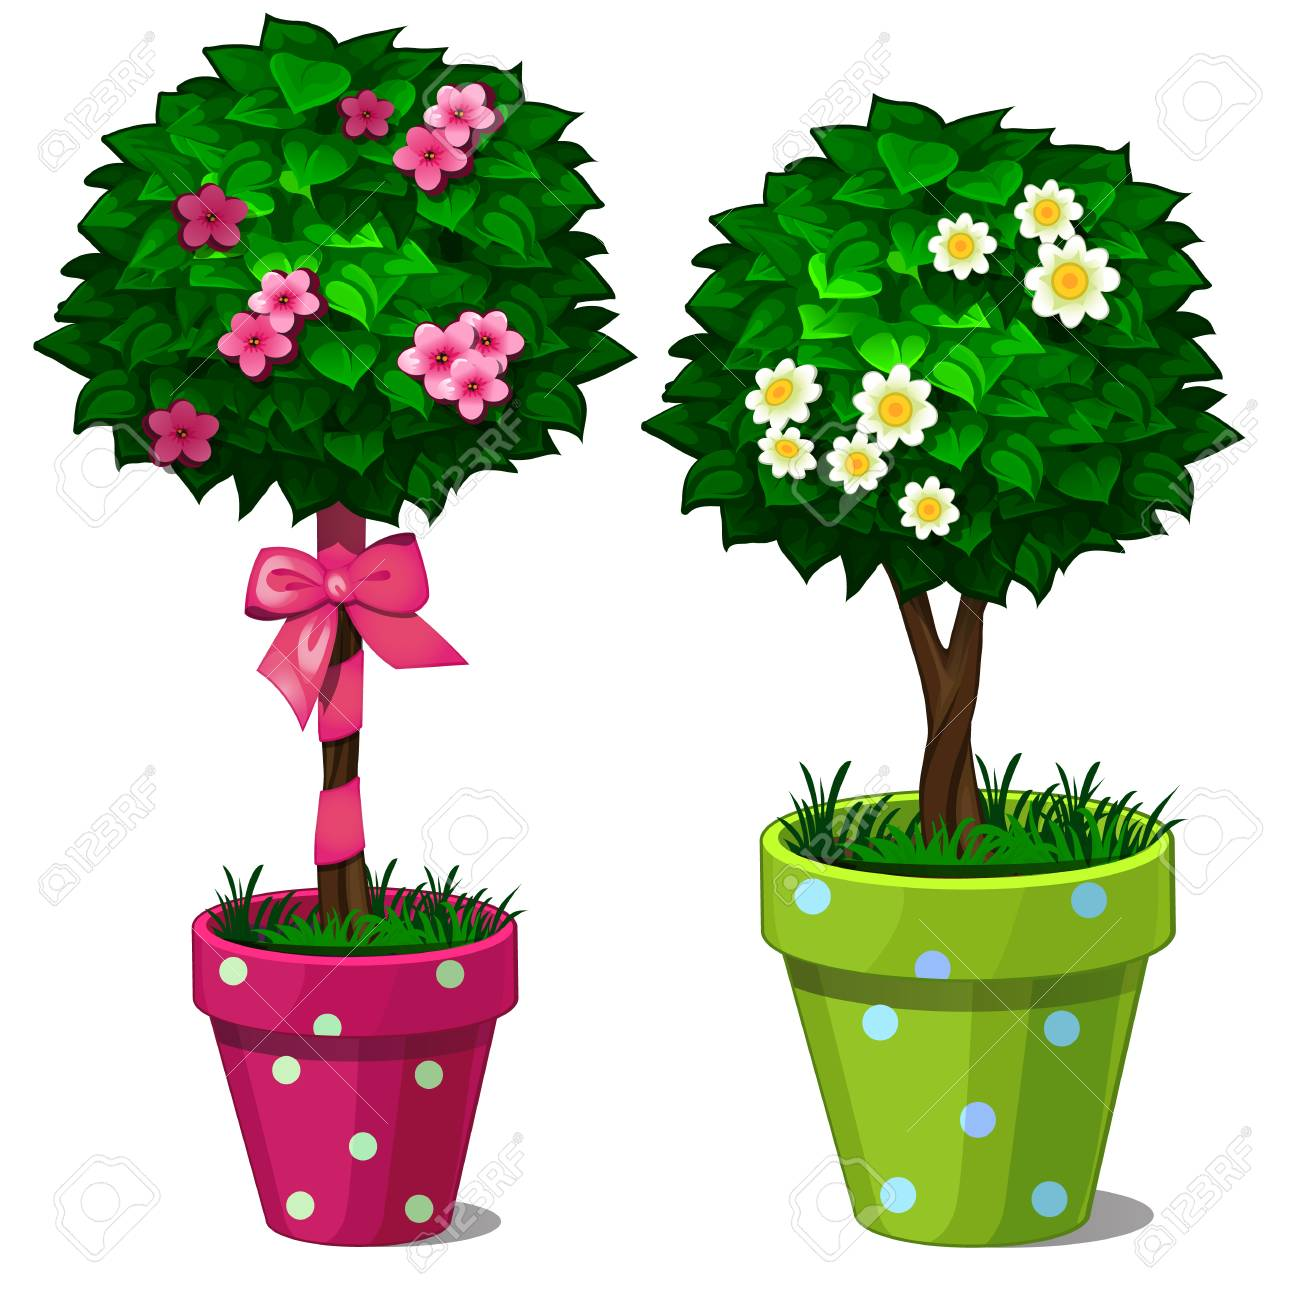 stock royalty decorative image plants vector handdraw in hand decor draw pots hd cute illustration